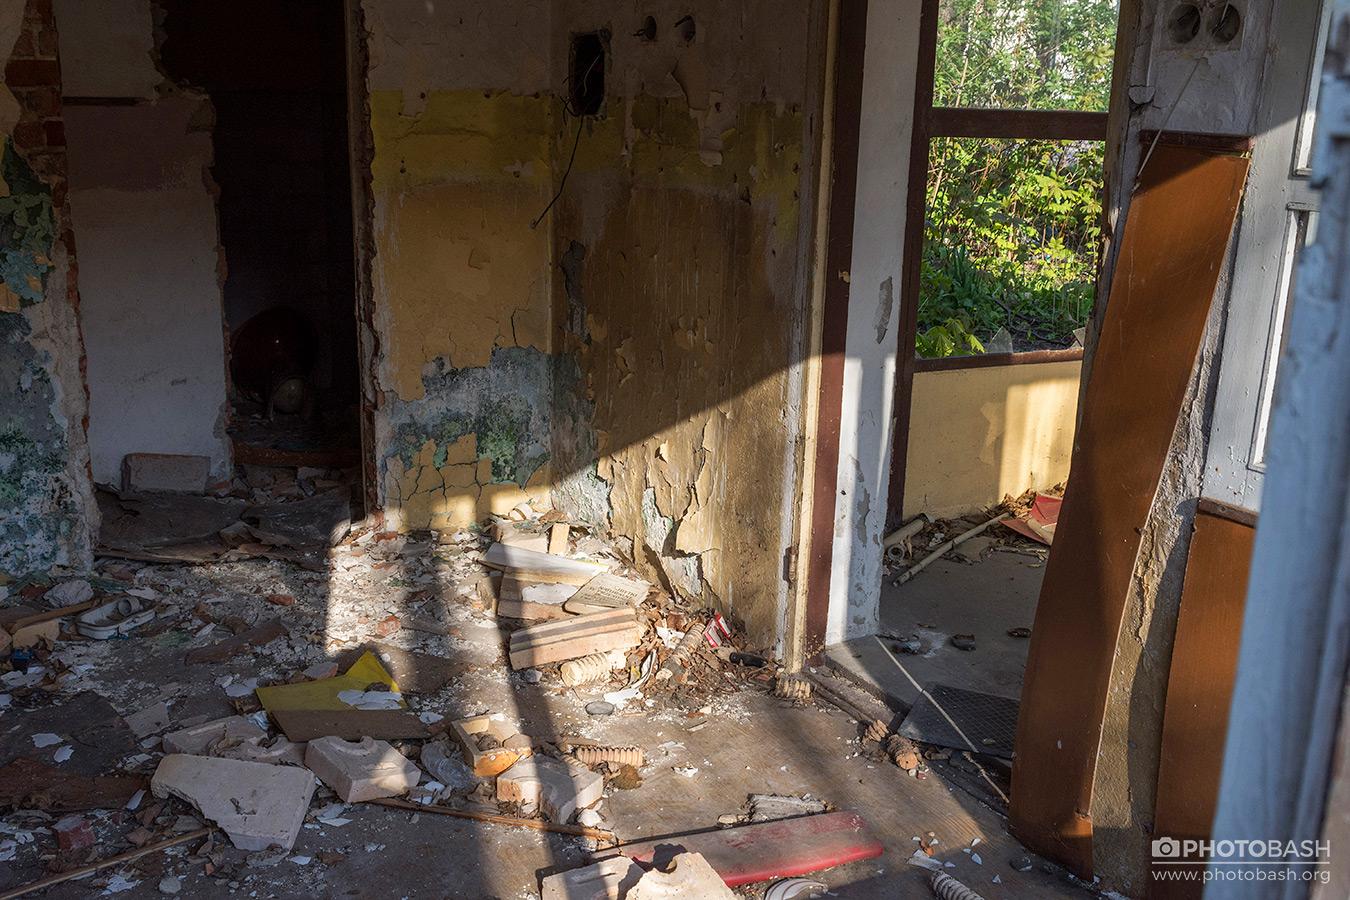 Abandoned-Interiors-Derelict-House.jpg